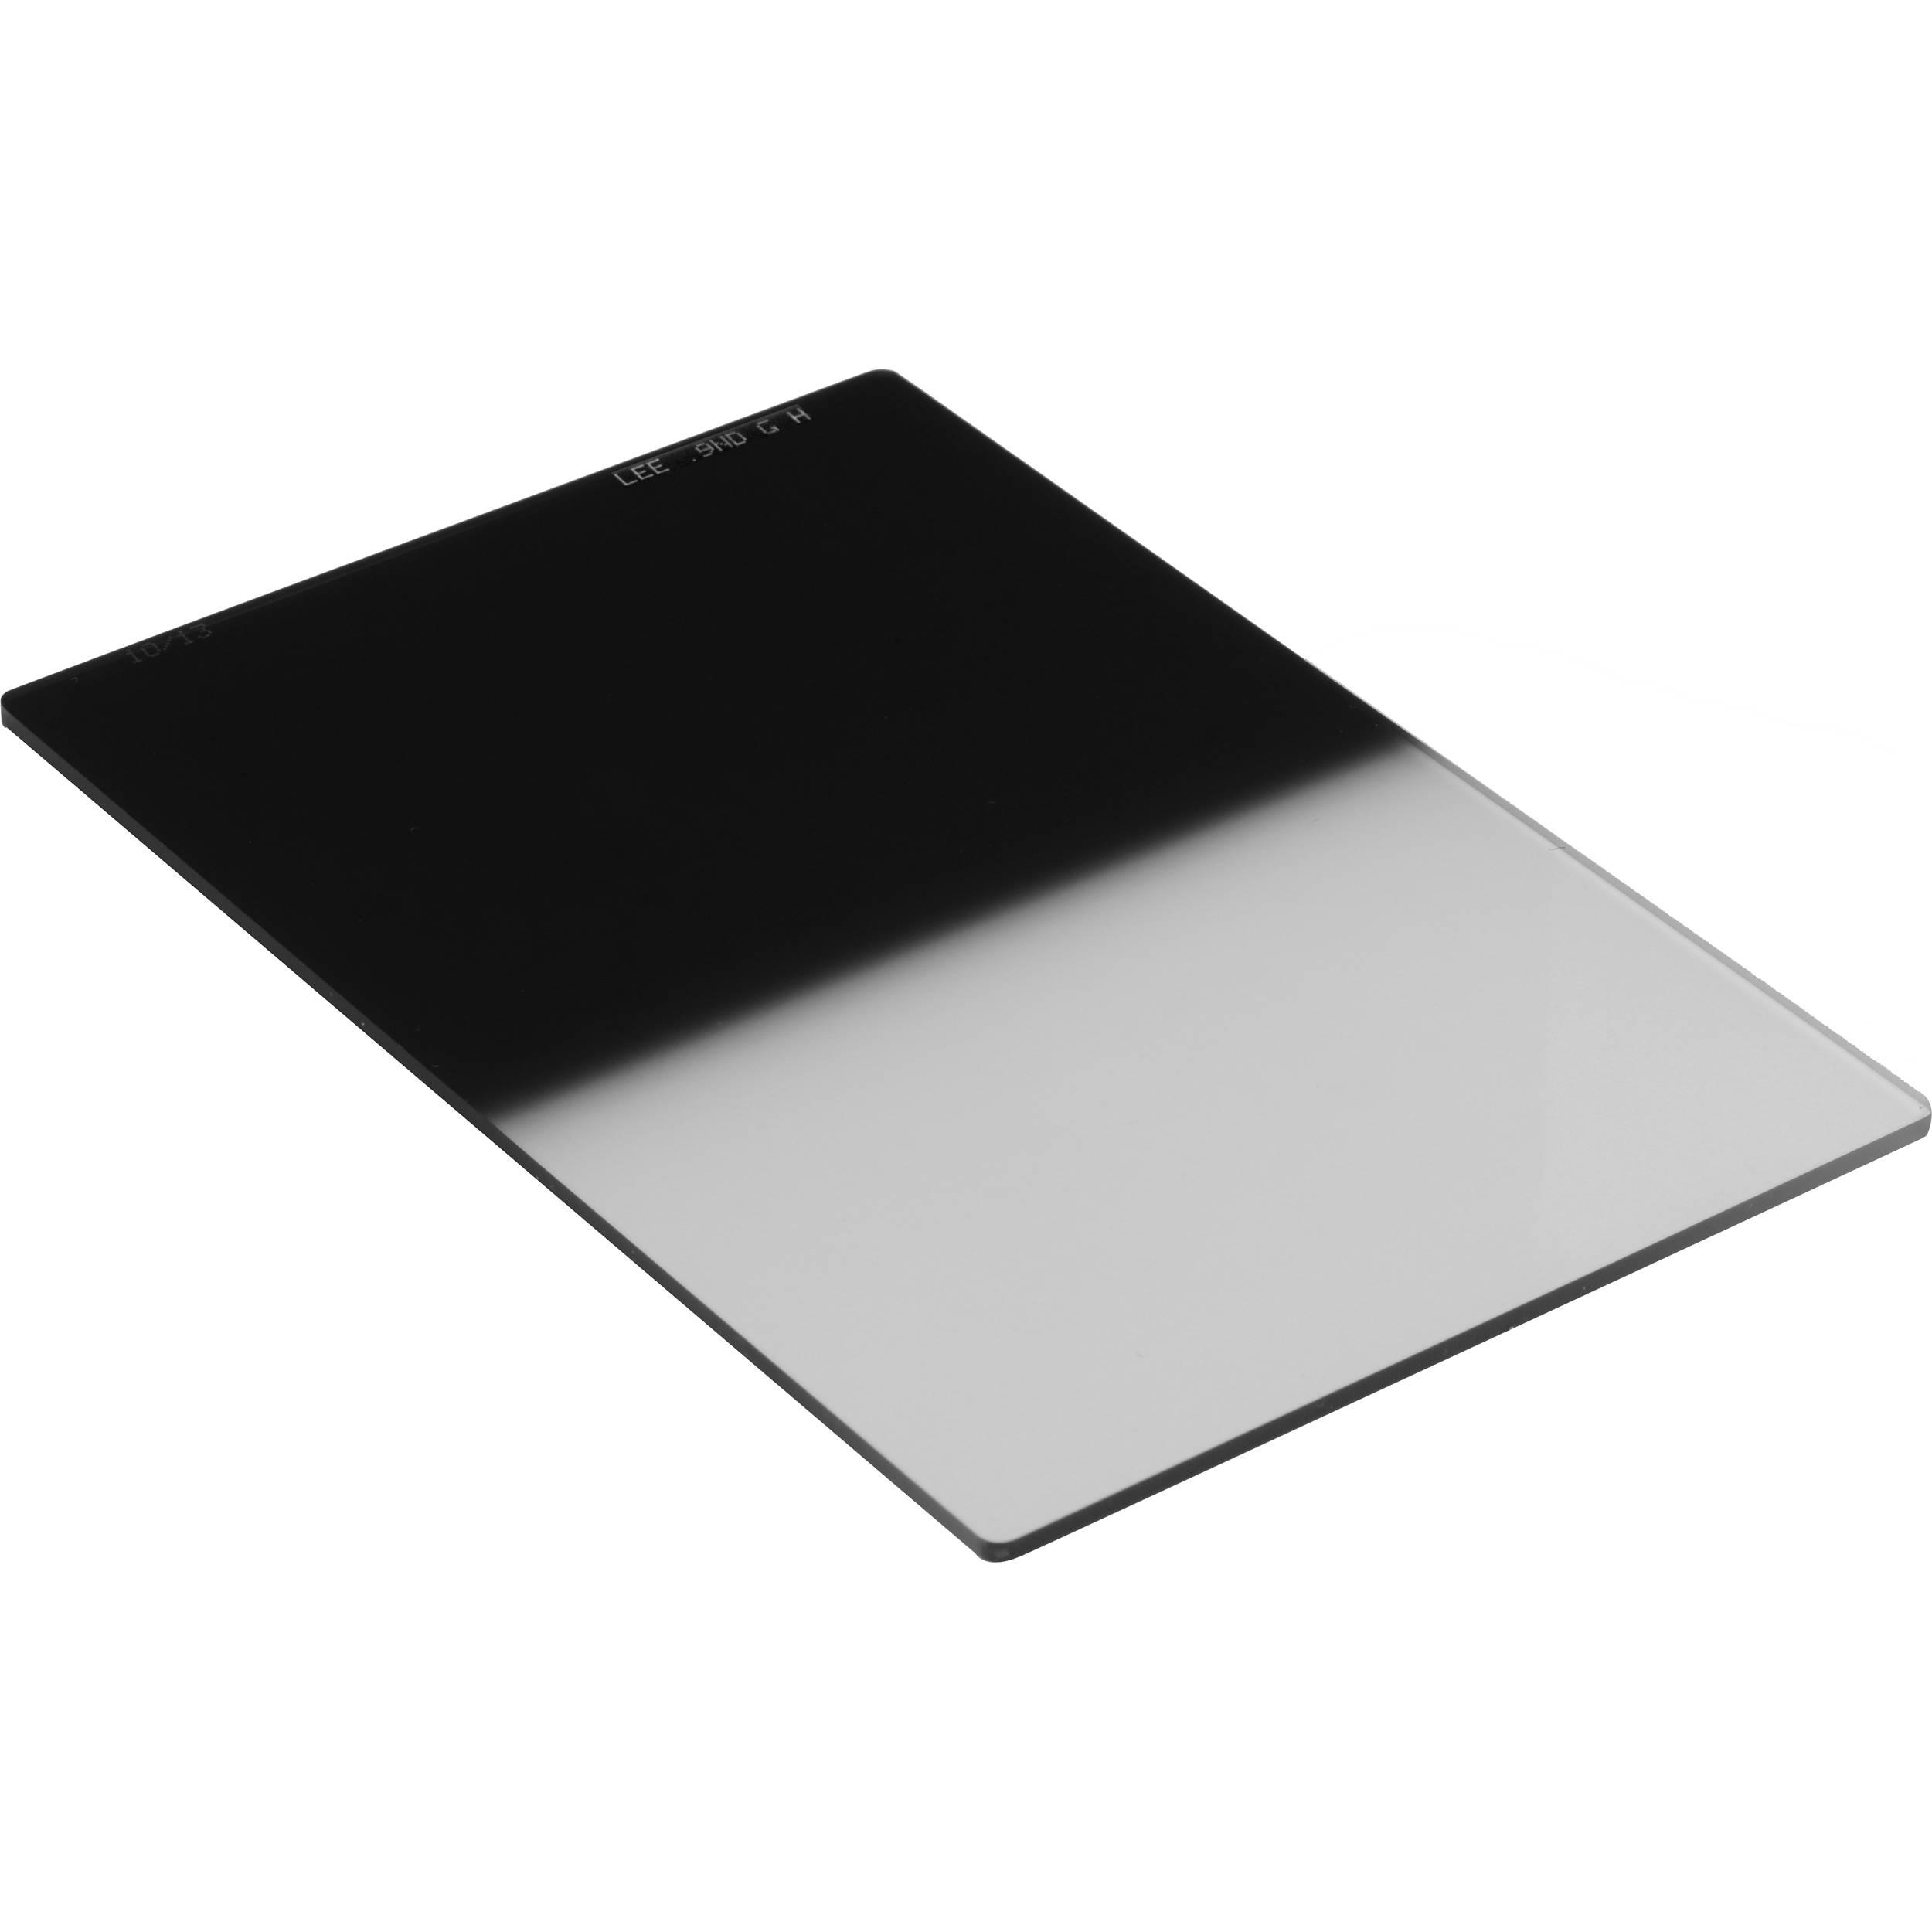 3-stop LEE Filters 100mm Graduated 0.9 Neutral Density Hard Edge ND